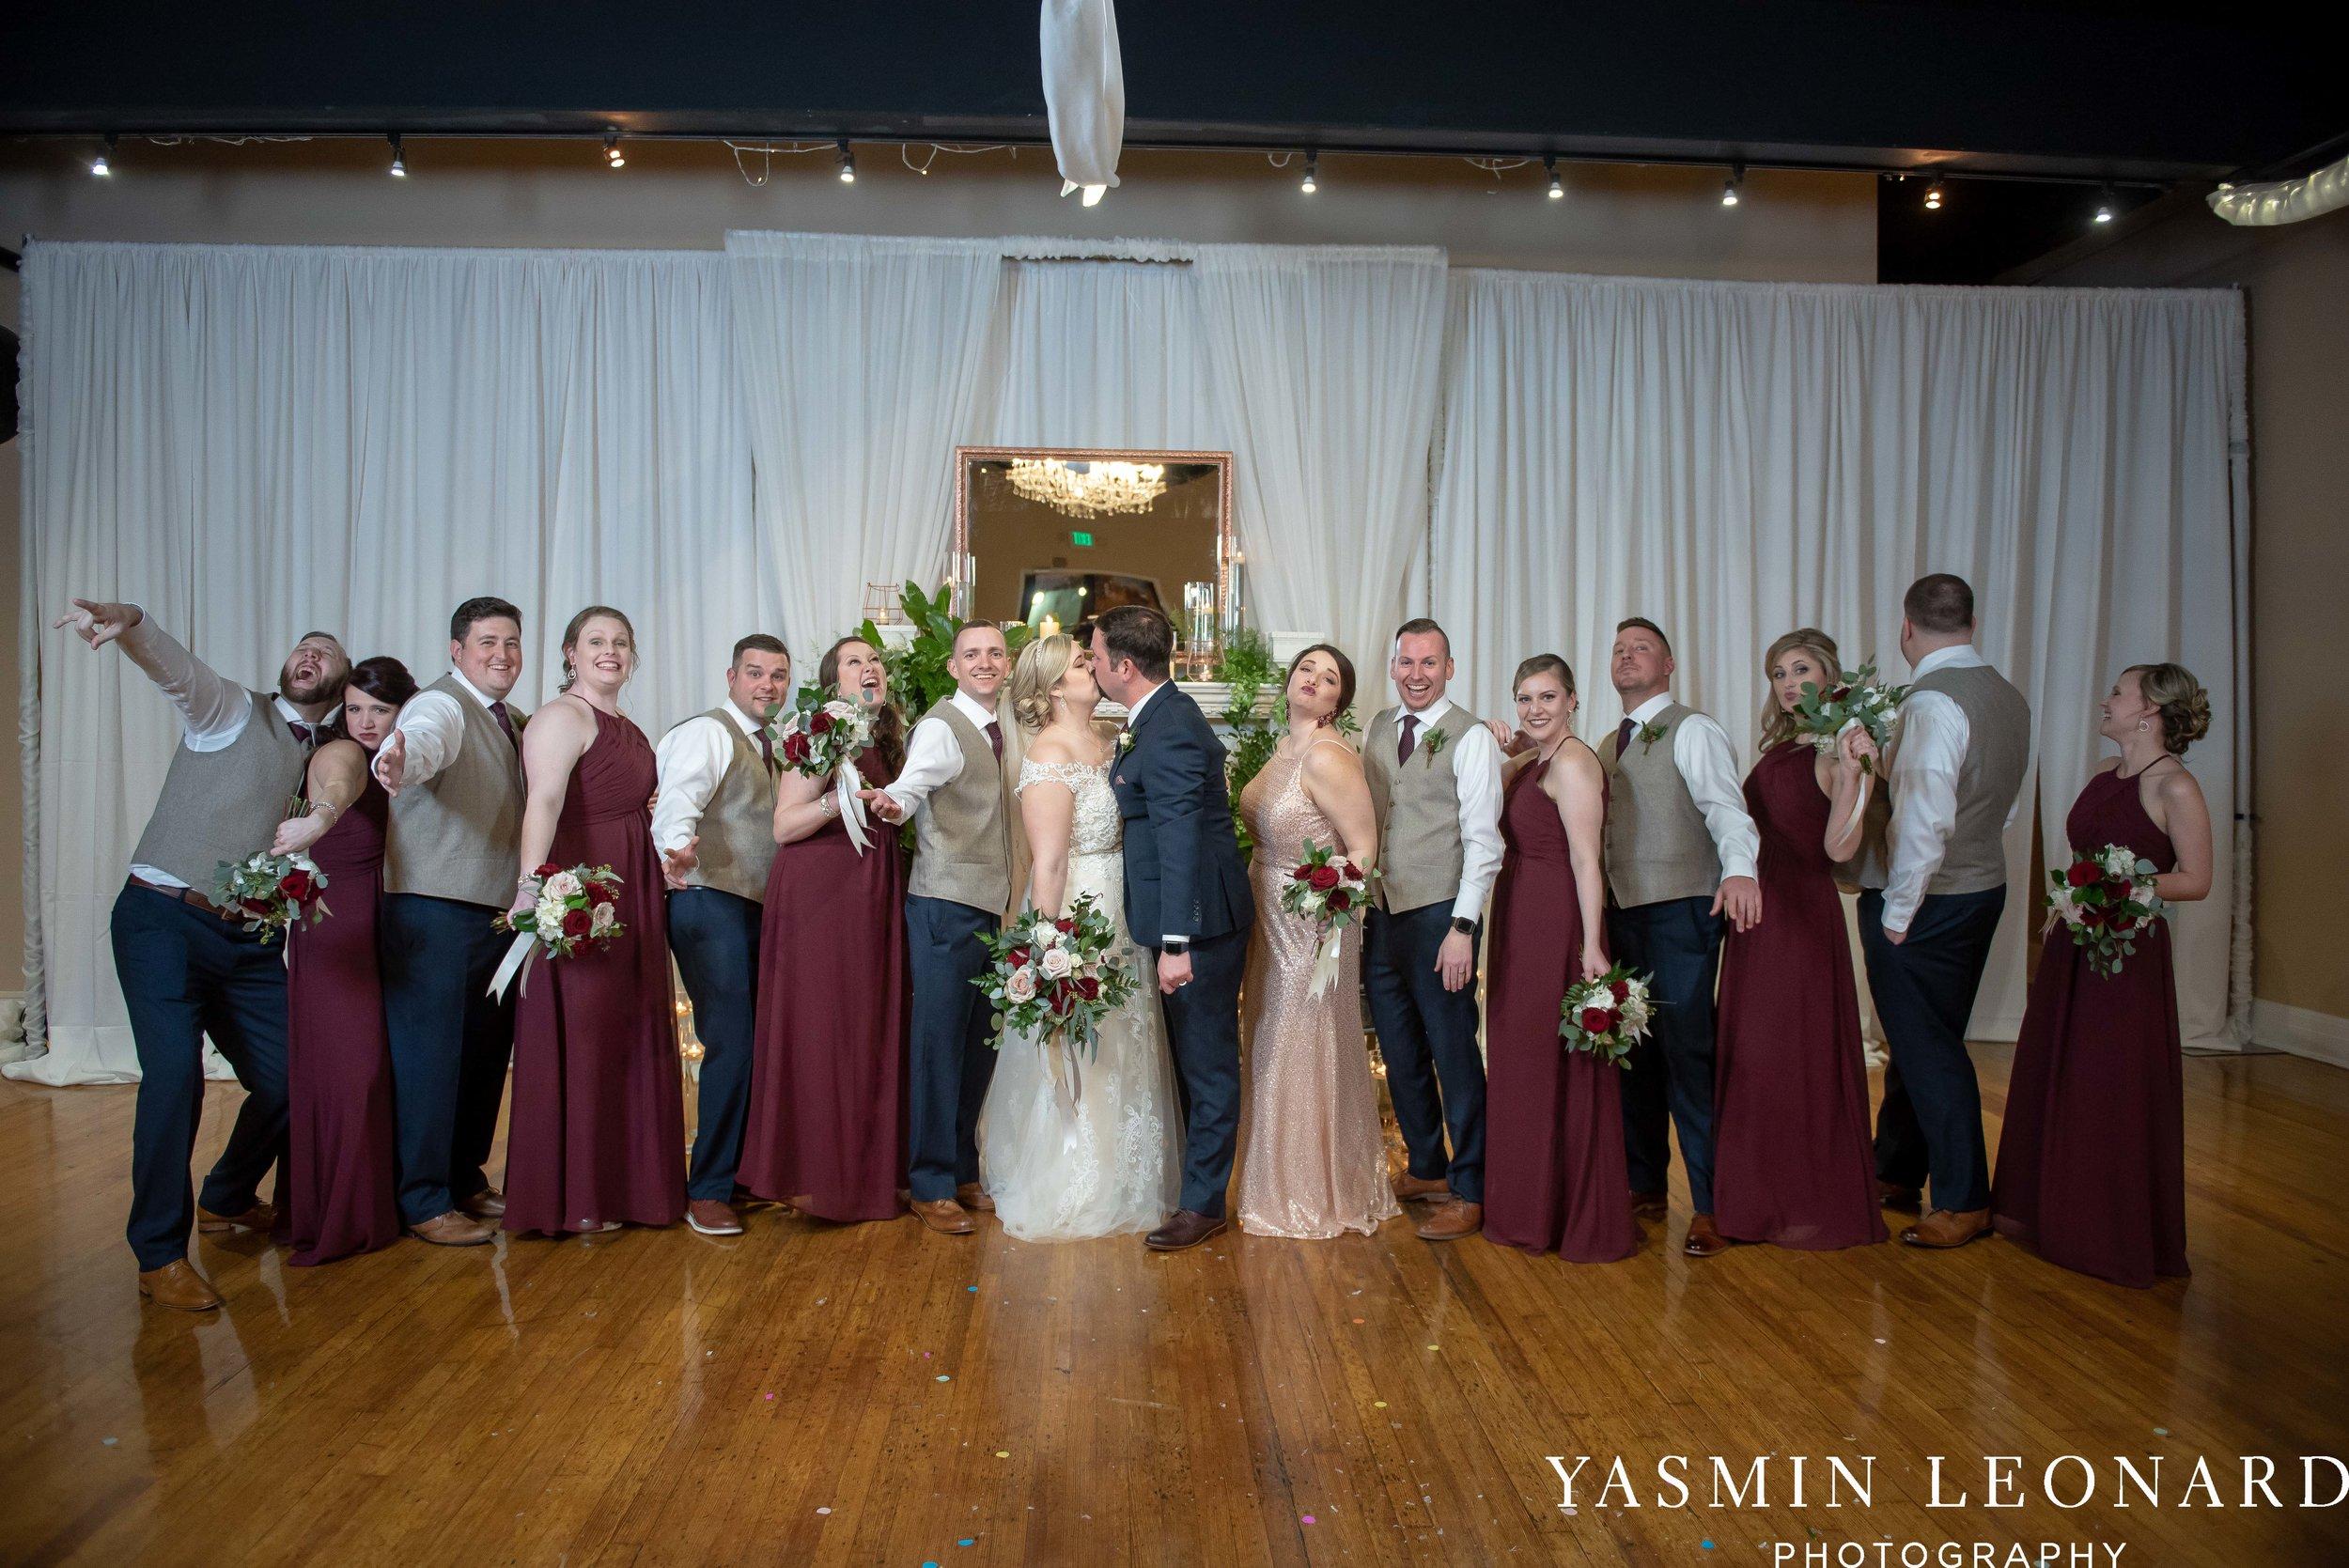 Rebekah and Matt - 105 Worth Event Centre - Yasmin Leonard Photography - Asheboro Wedding - NC Wedding - High Point Weddings - Triad Weddings - Winter Wedding-34.jpg